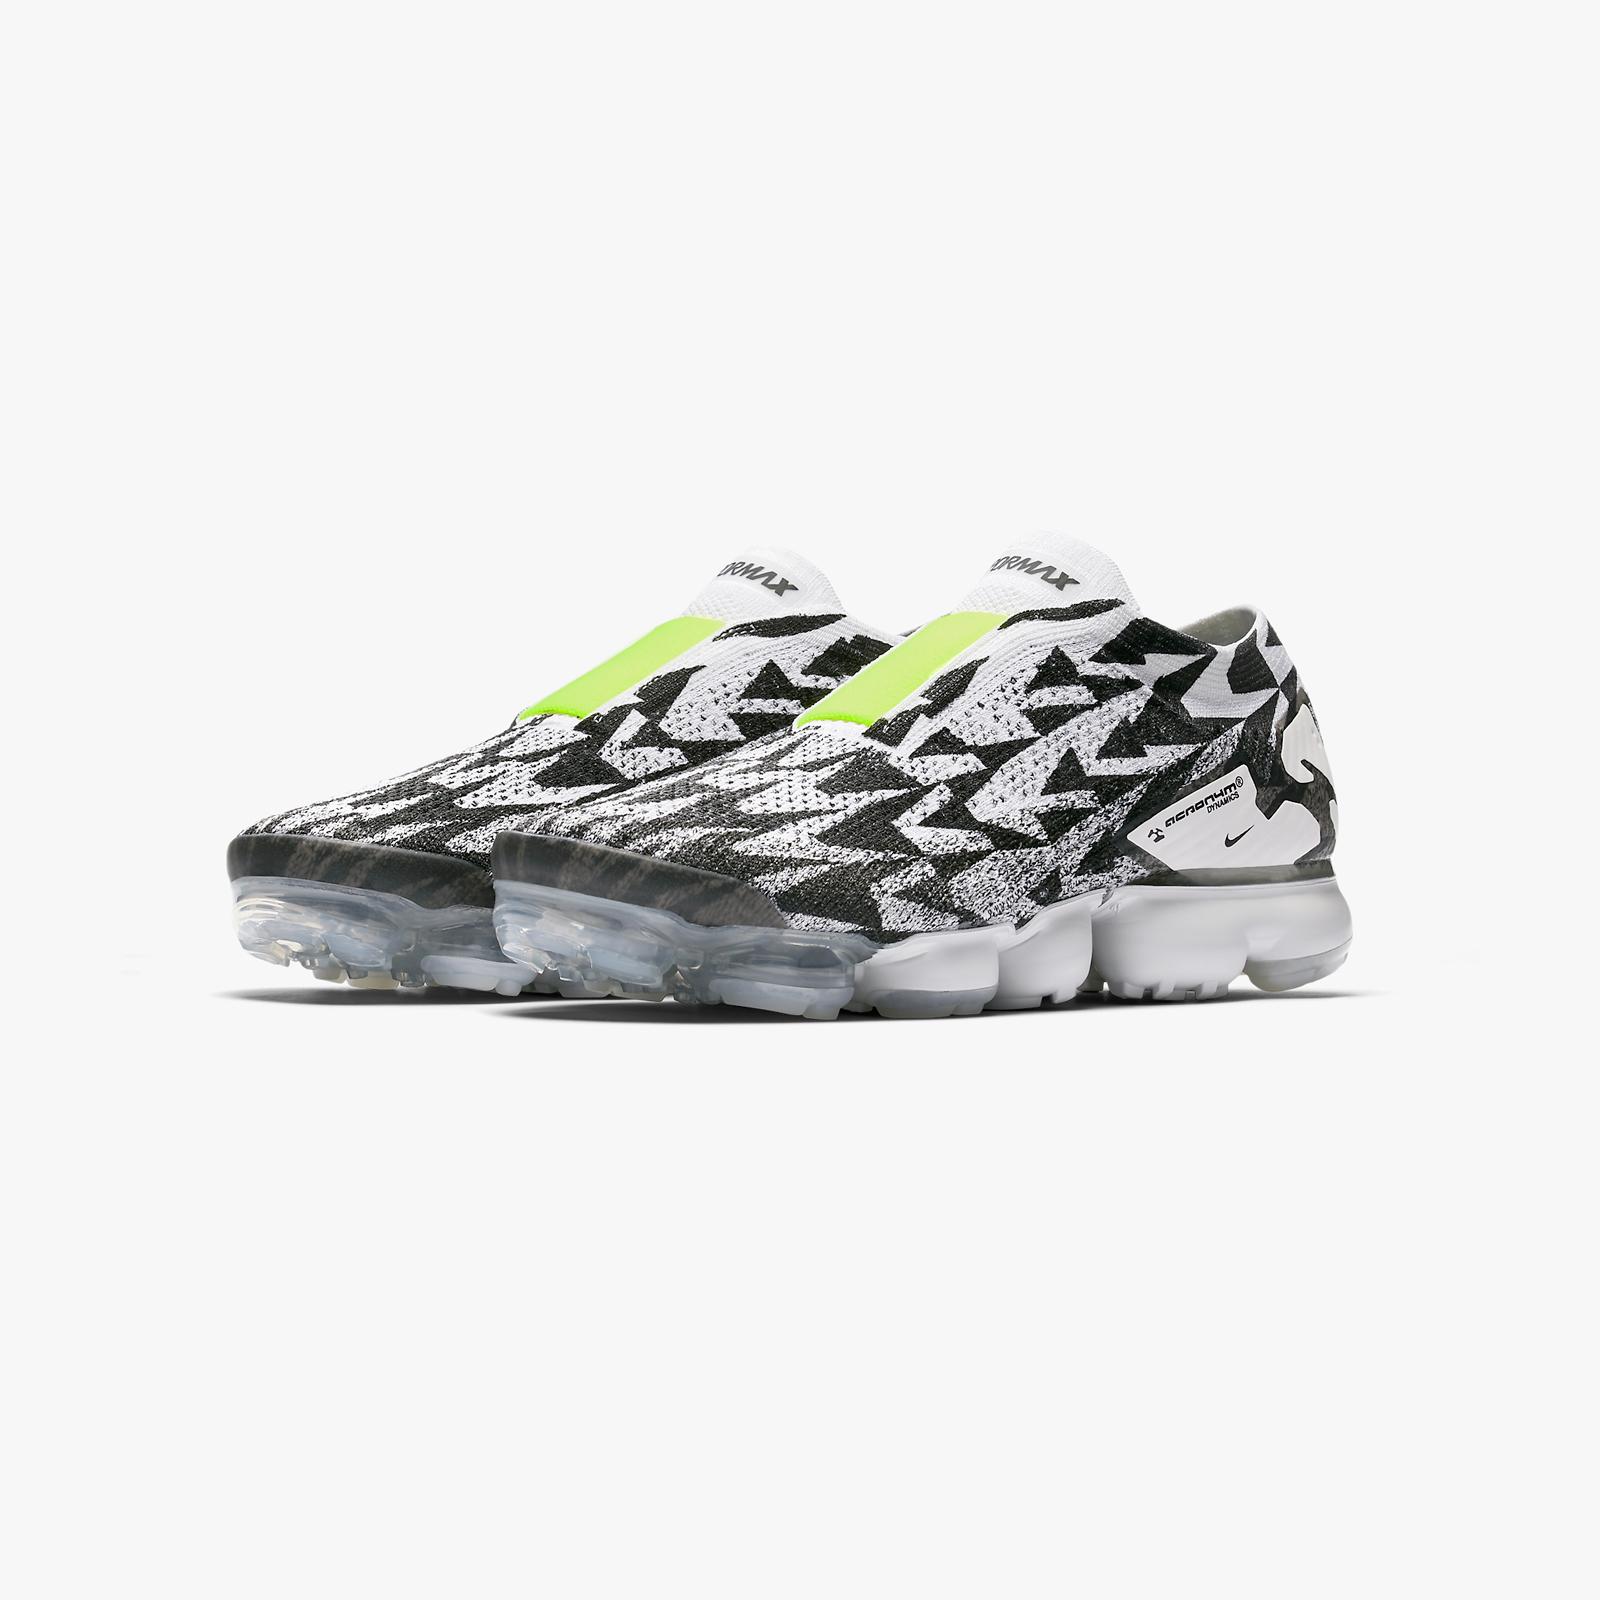 Nike Air Vapormax FK Moc 2 / ACRONYM